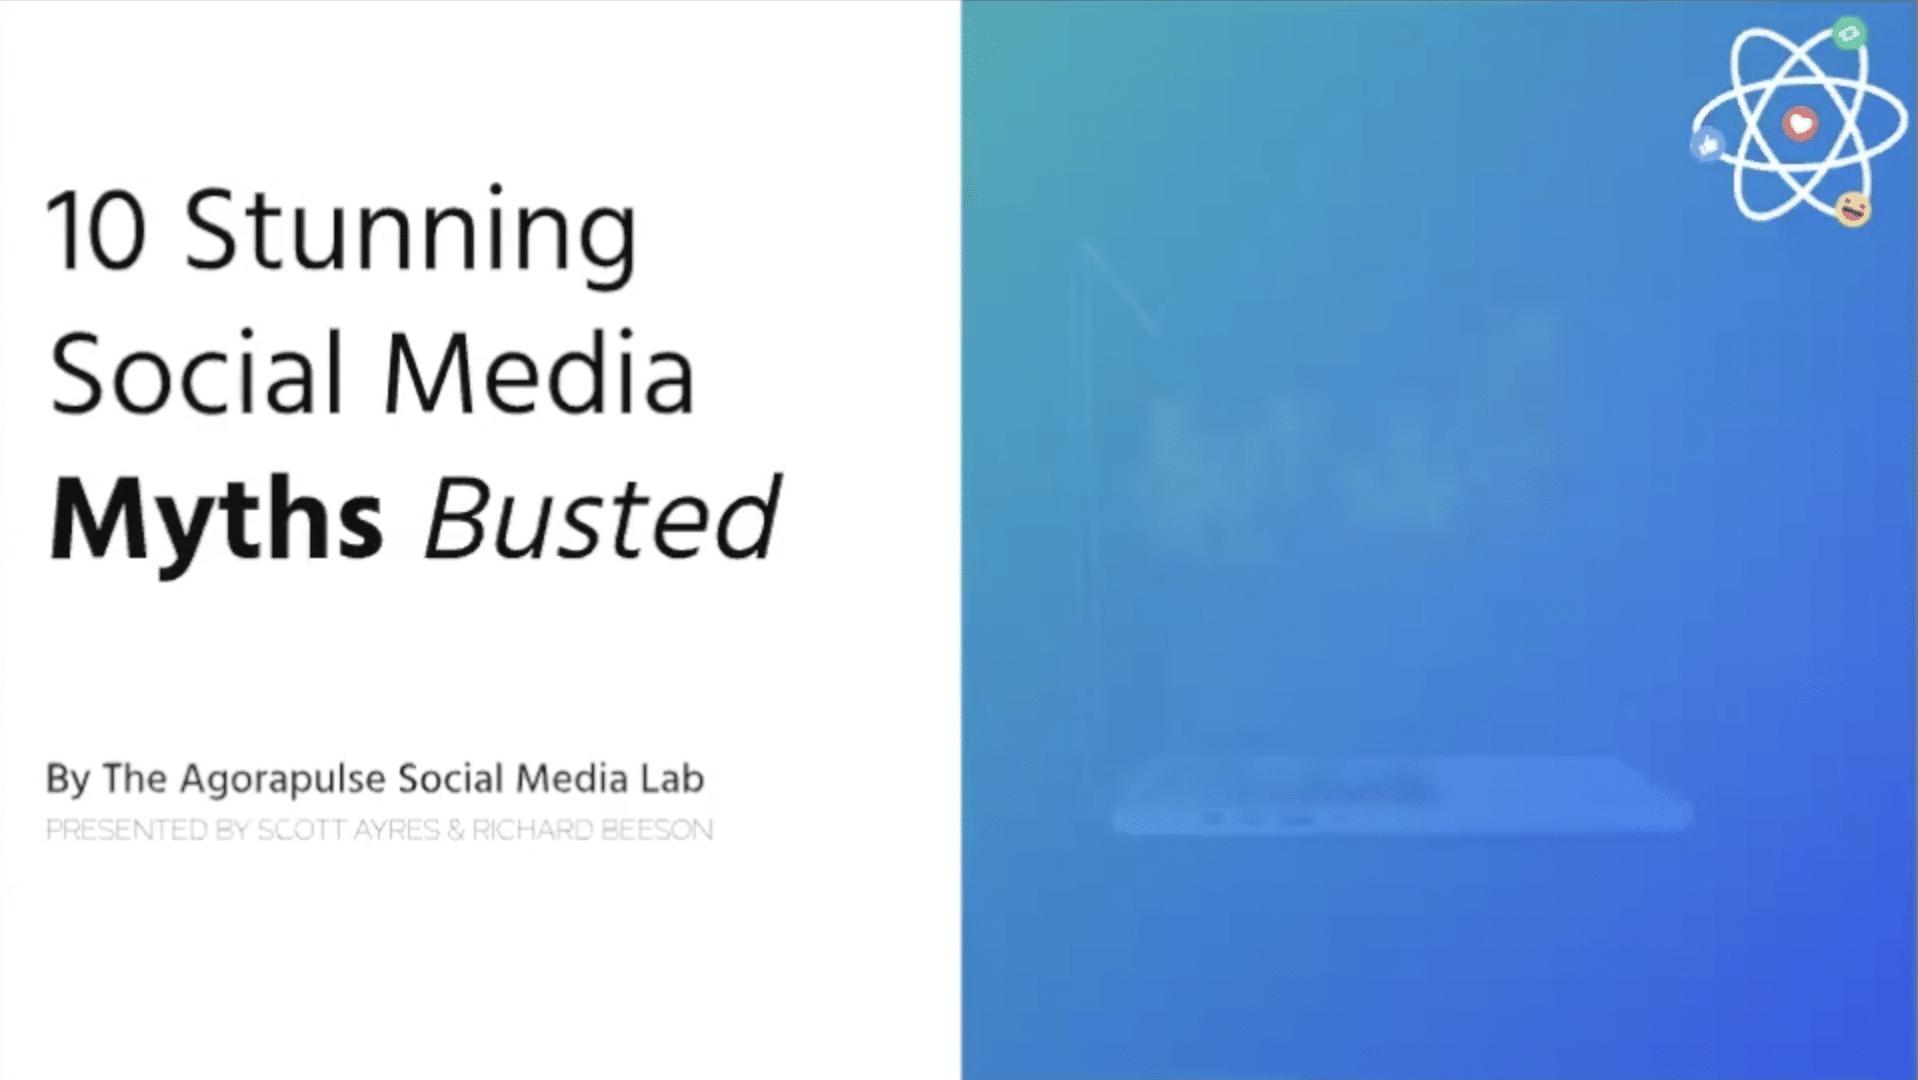 EXPERT WEBINAR: 10 Stunning Social Media Myths Busted with Scott Ayres